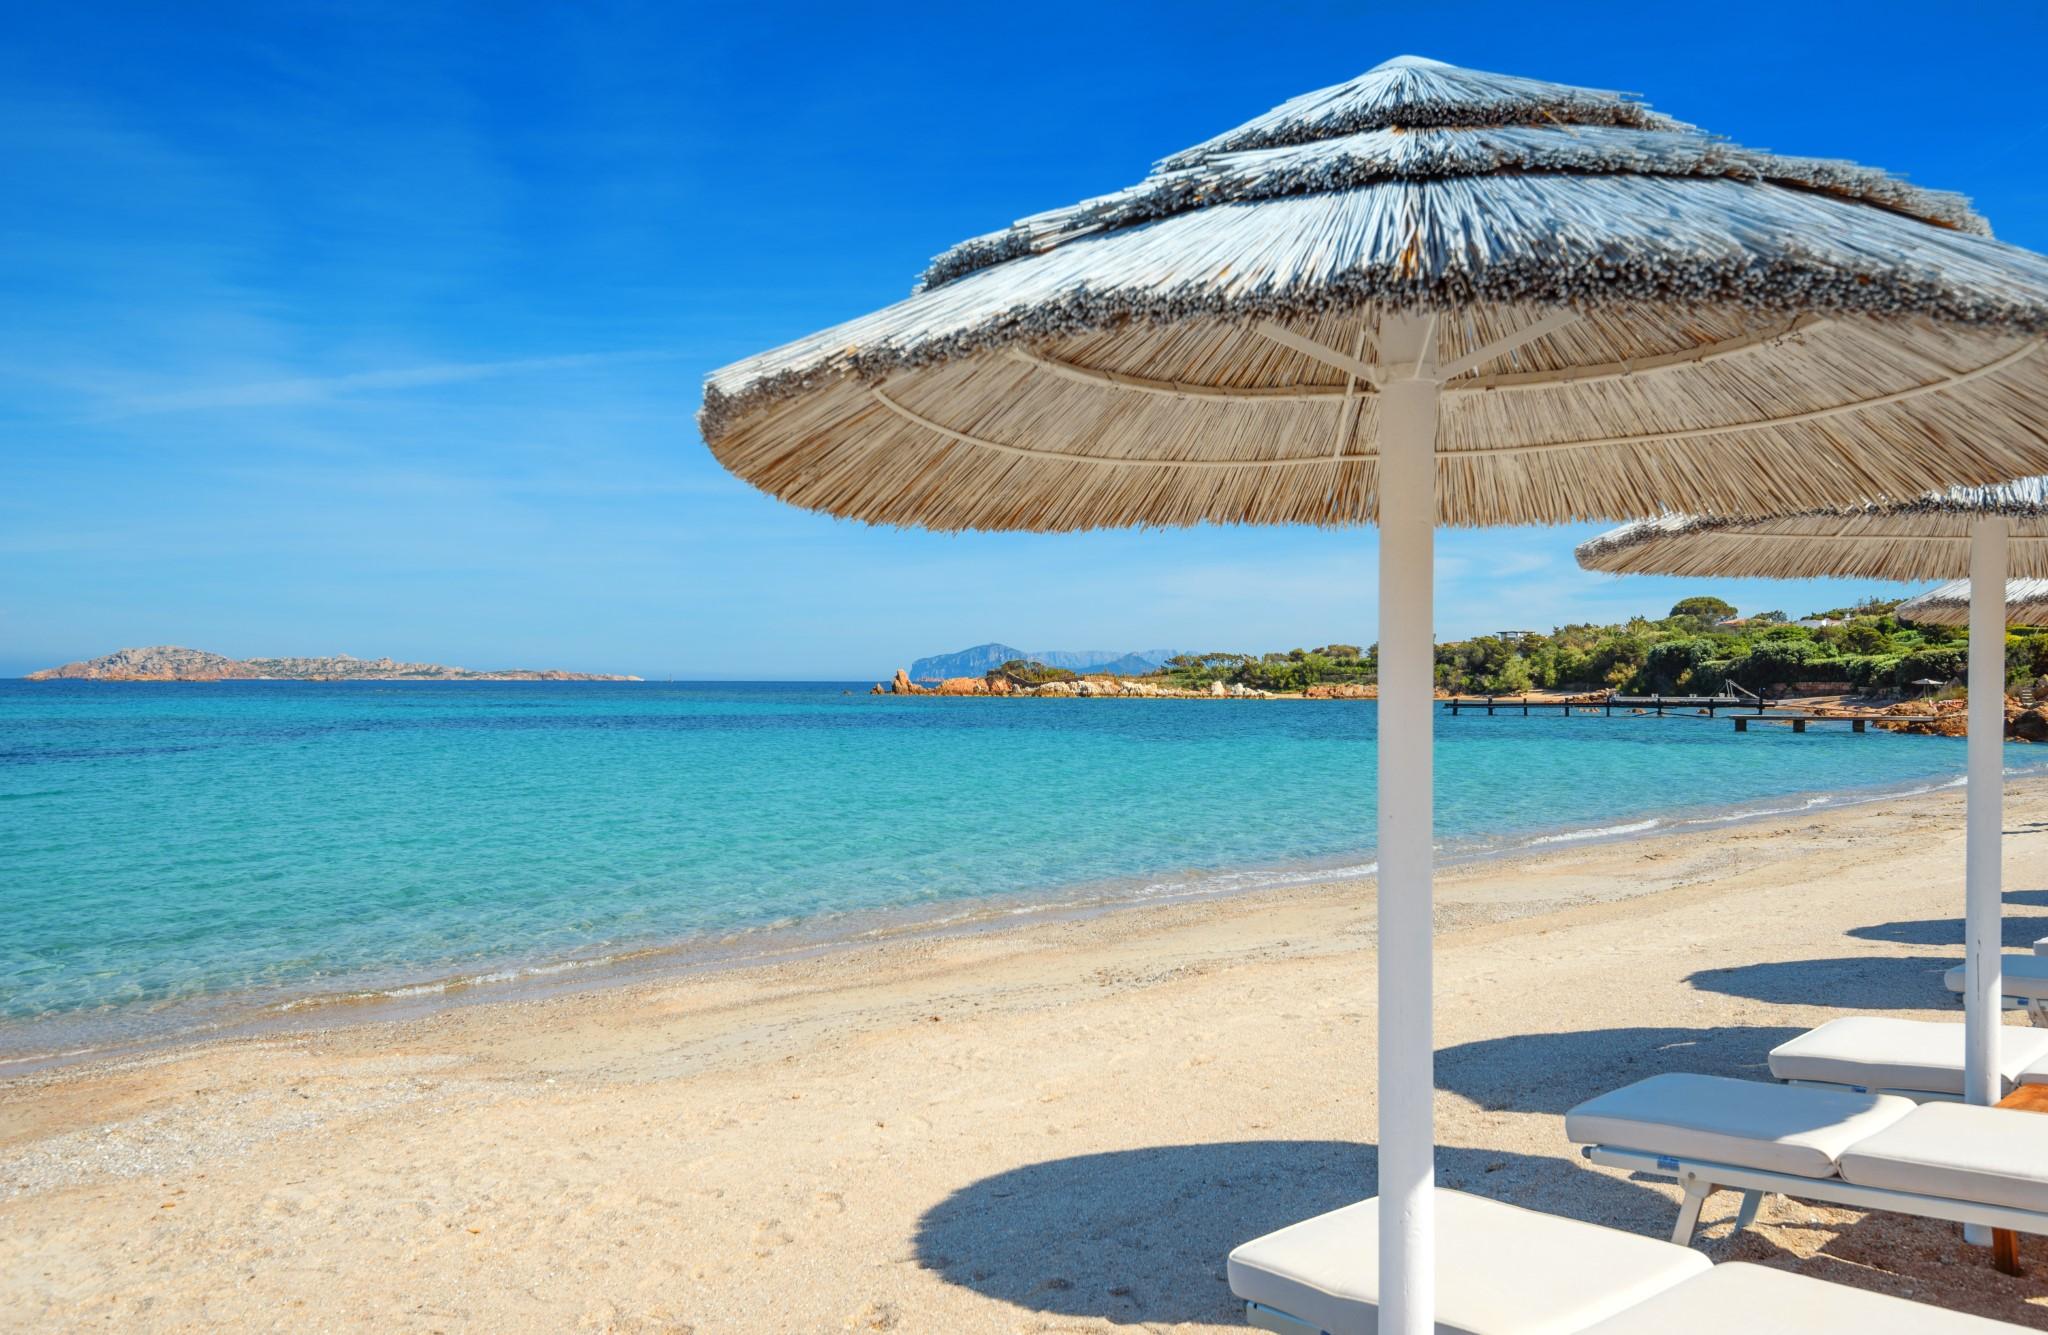 romazzino beach with white umbrellas,emerald coast of Sardinia,Italy